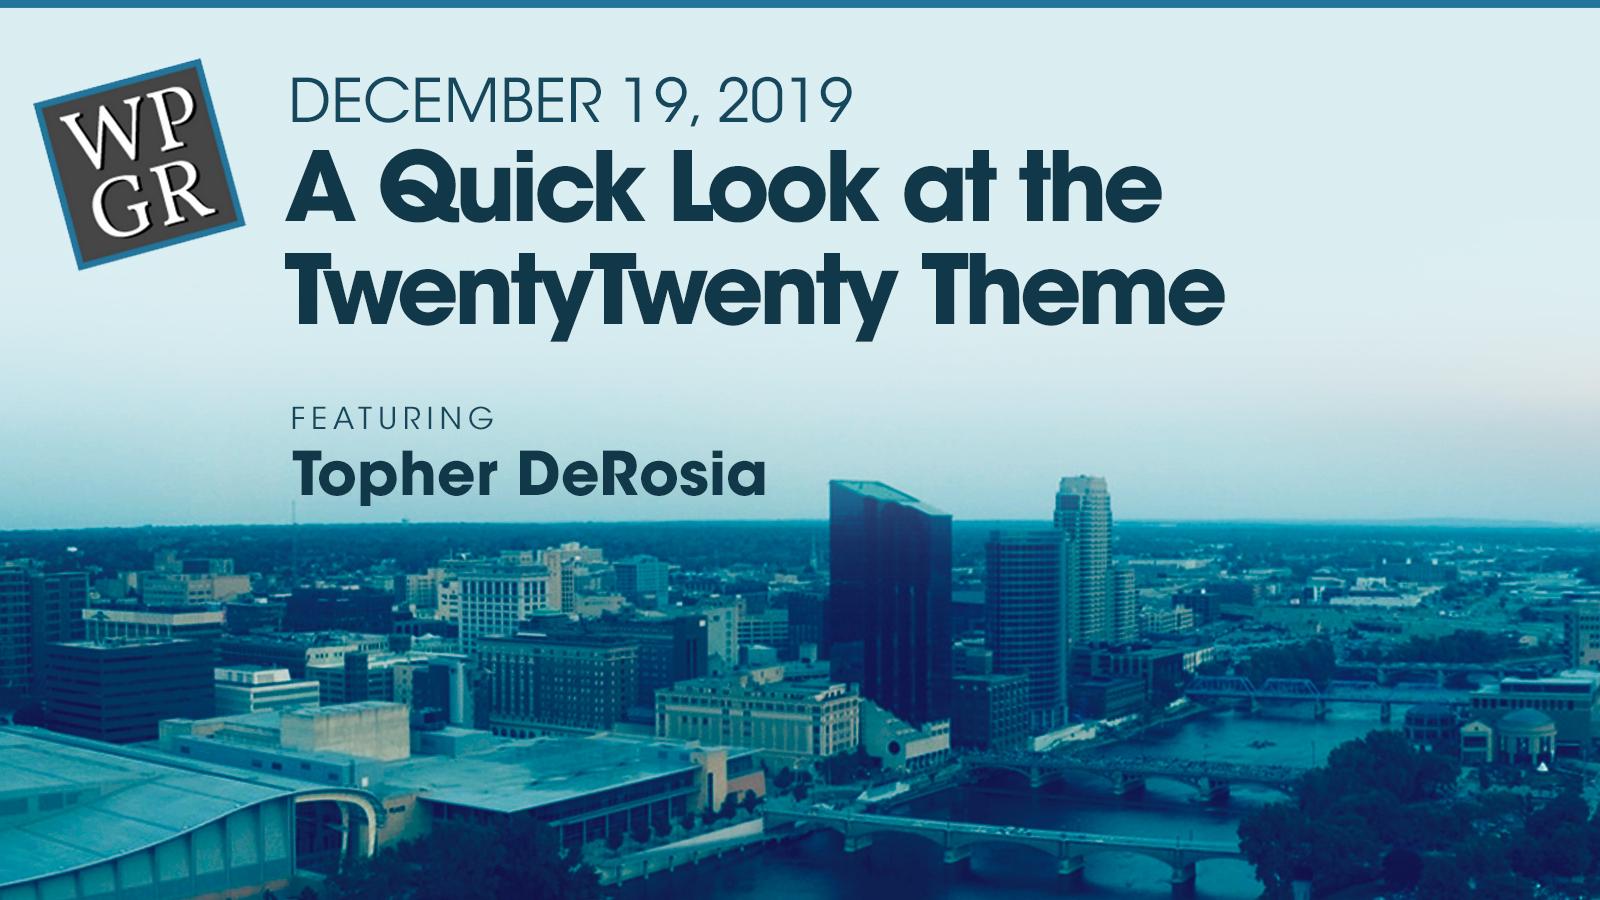 Banner: A quick look a the TwentyTwenty theme.